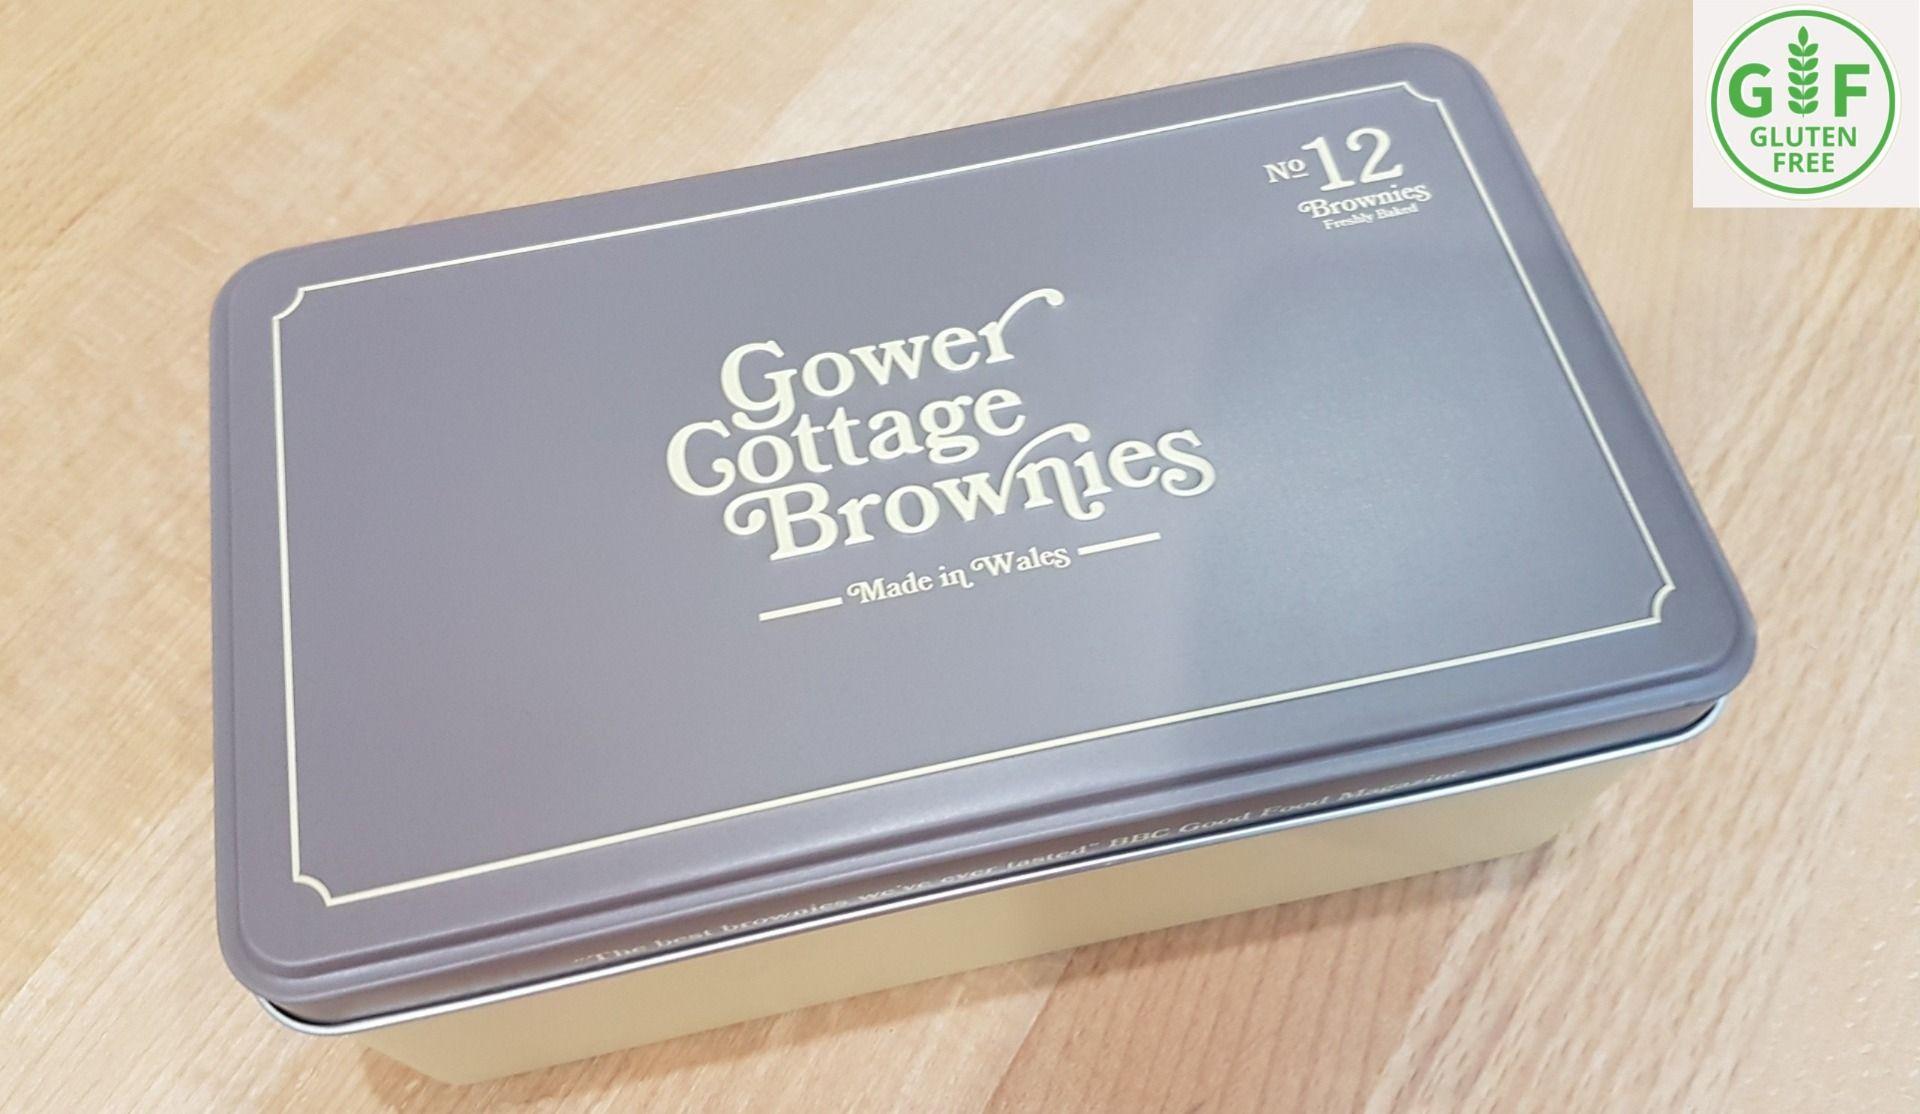 Gluten Free Chocolate Orange Brownies in a presentation tin